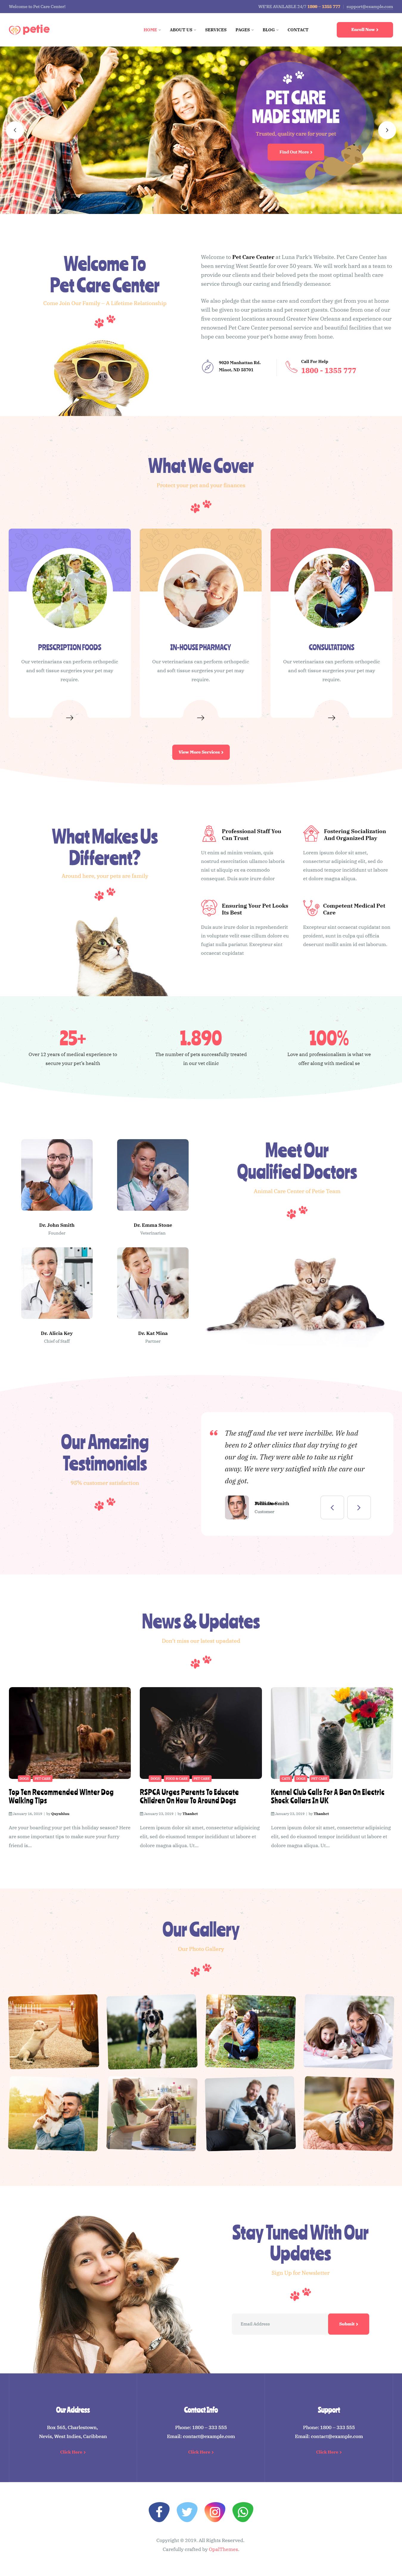 petie best premium animal and pet wordpress theme - 10+ Best Premium Animal and Pet WordPress Themes